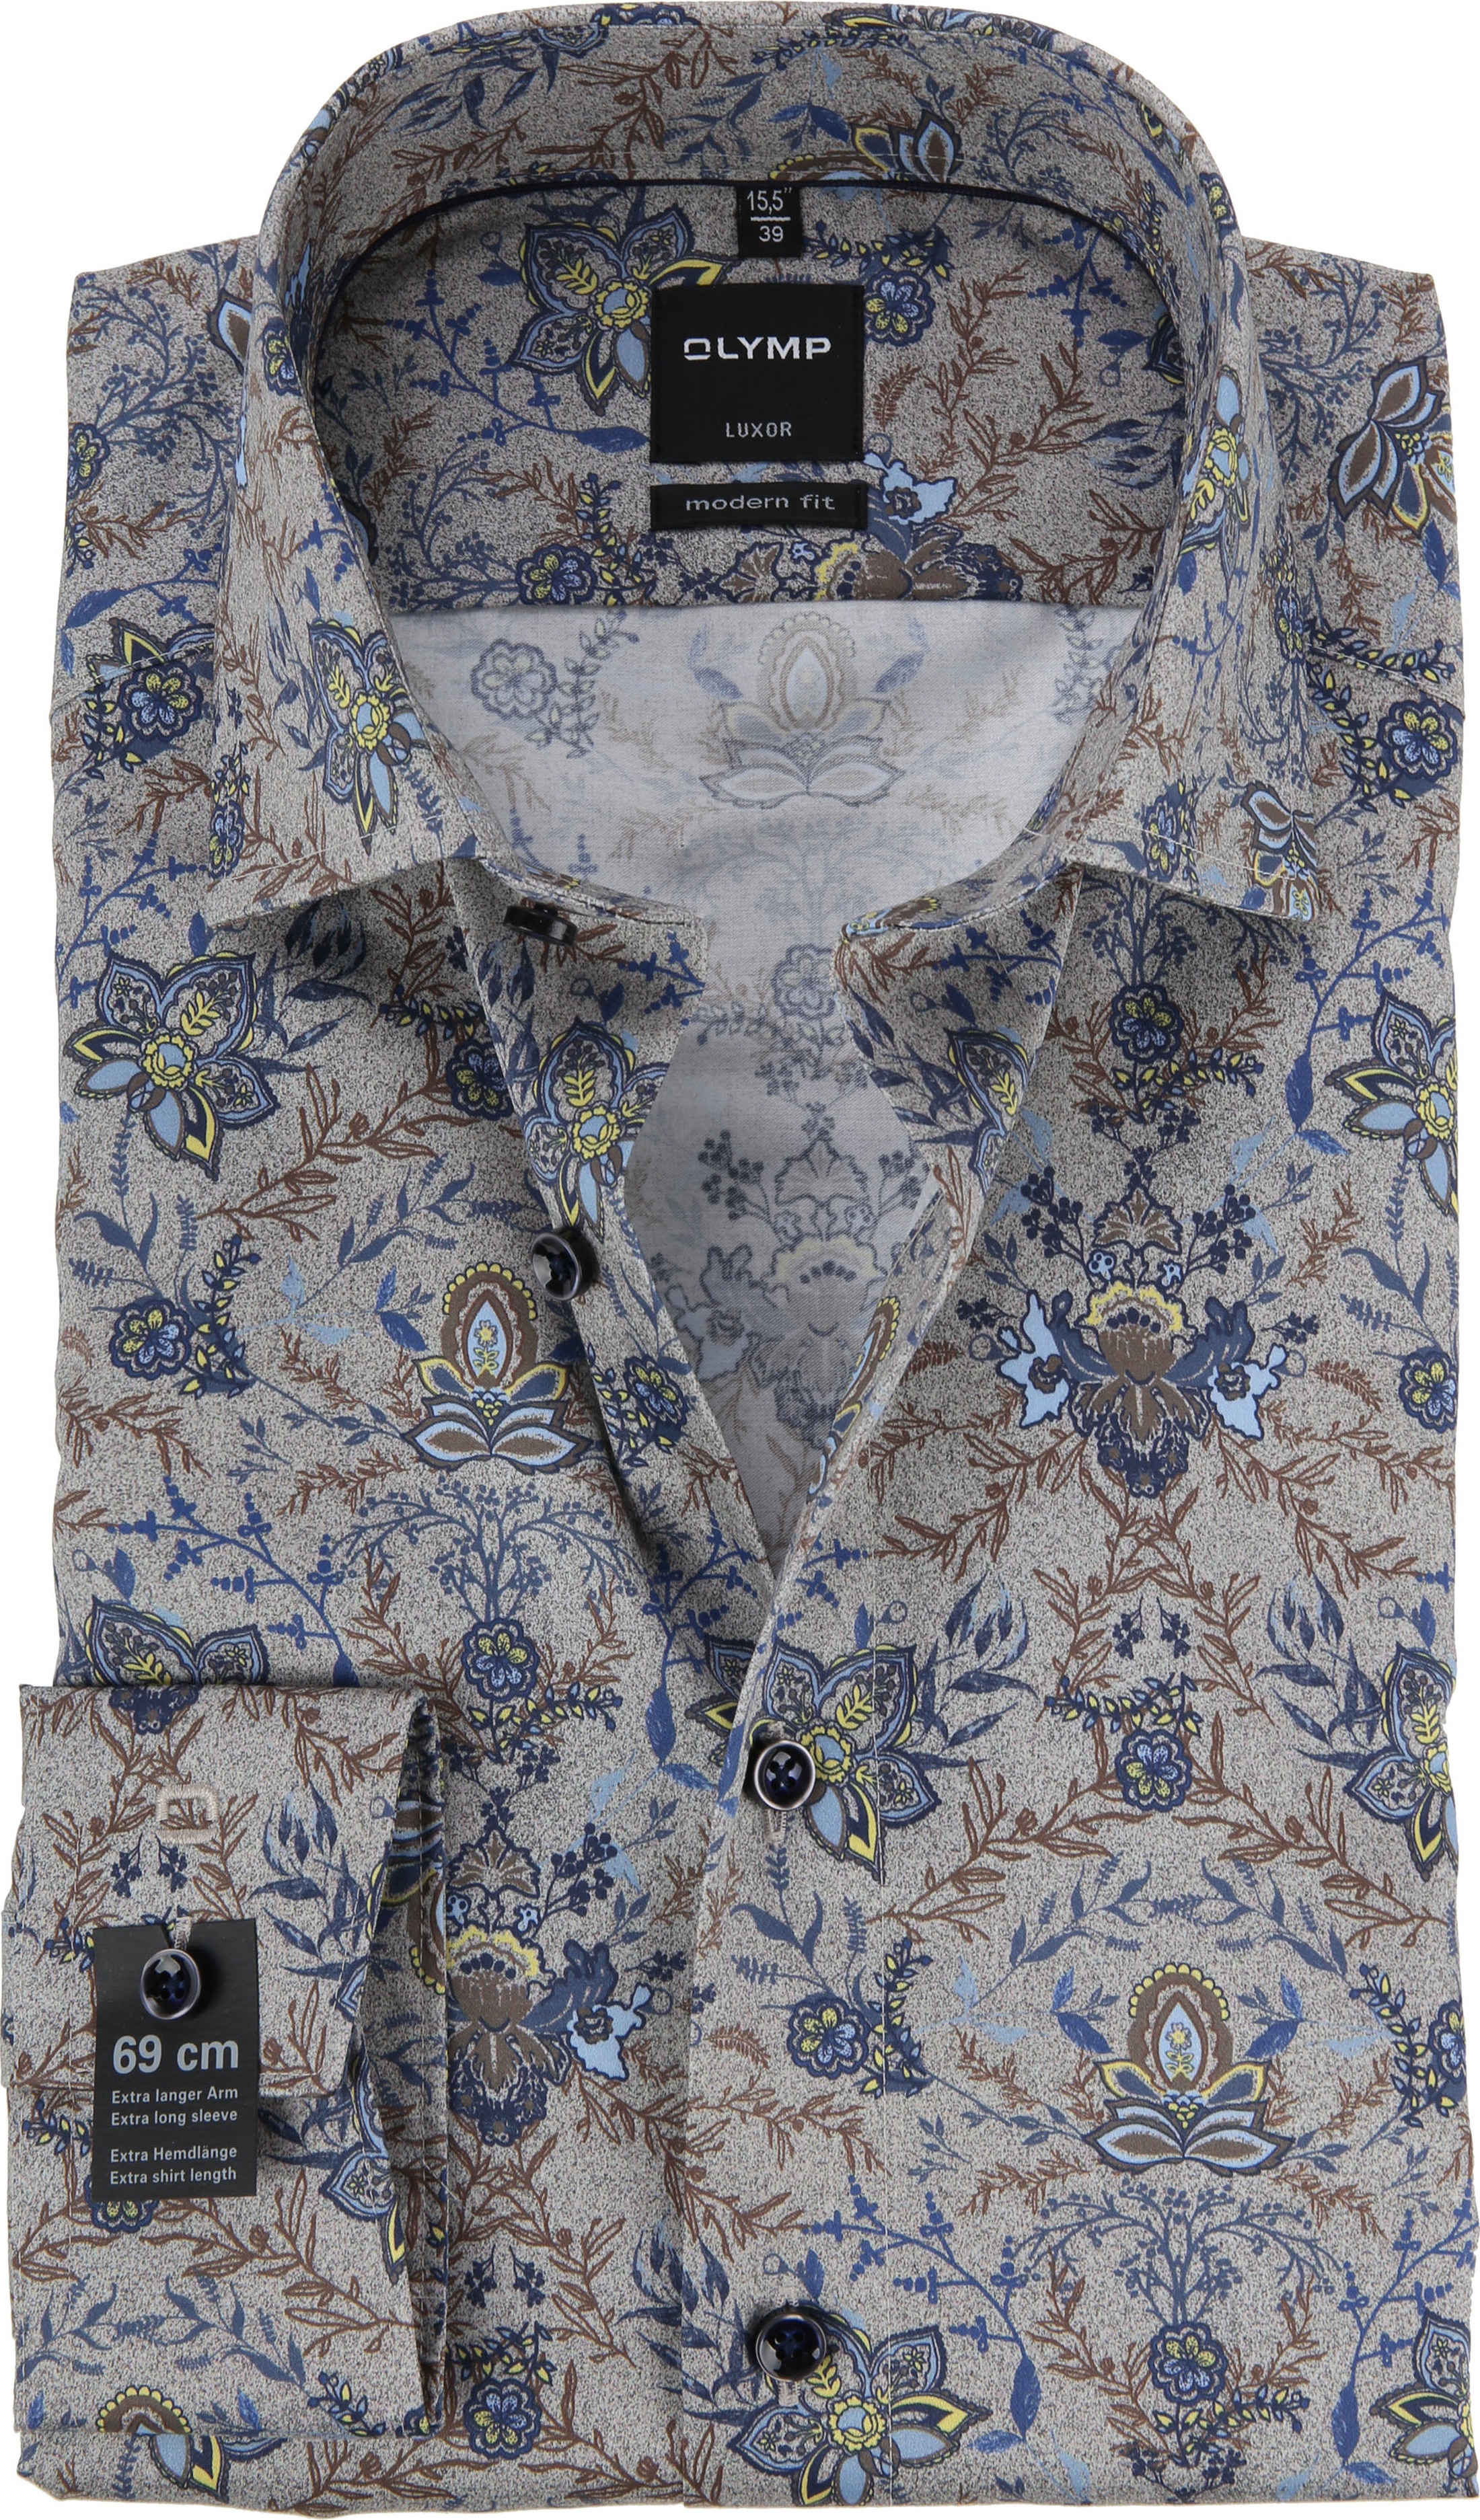 OLYMP Luxor MF Hemd Blume SL7 120439 online kaufen | Suitable